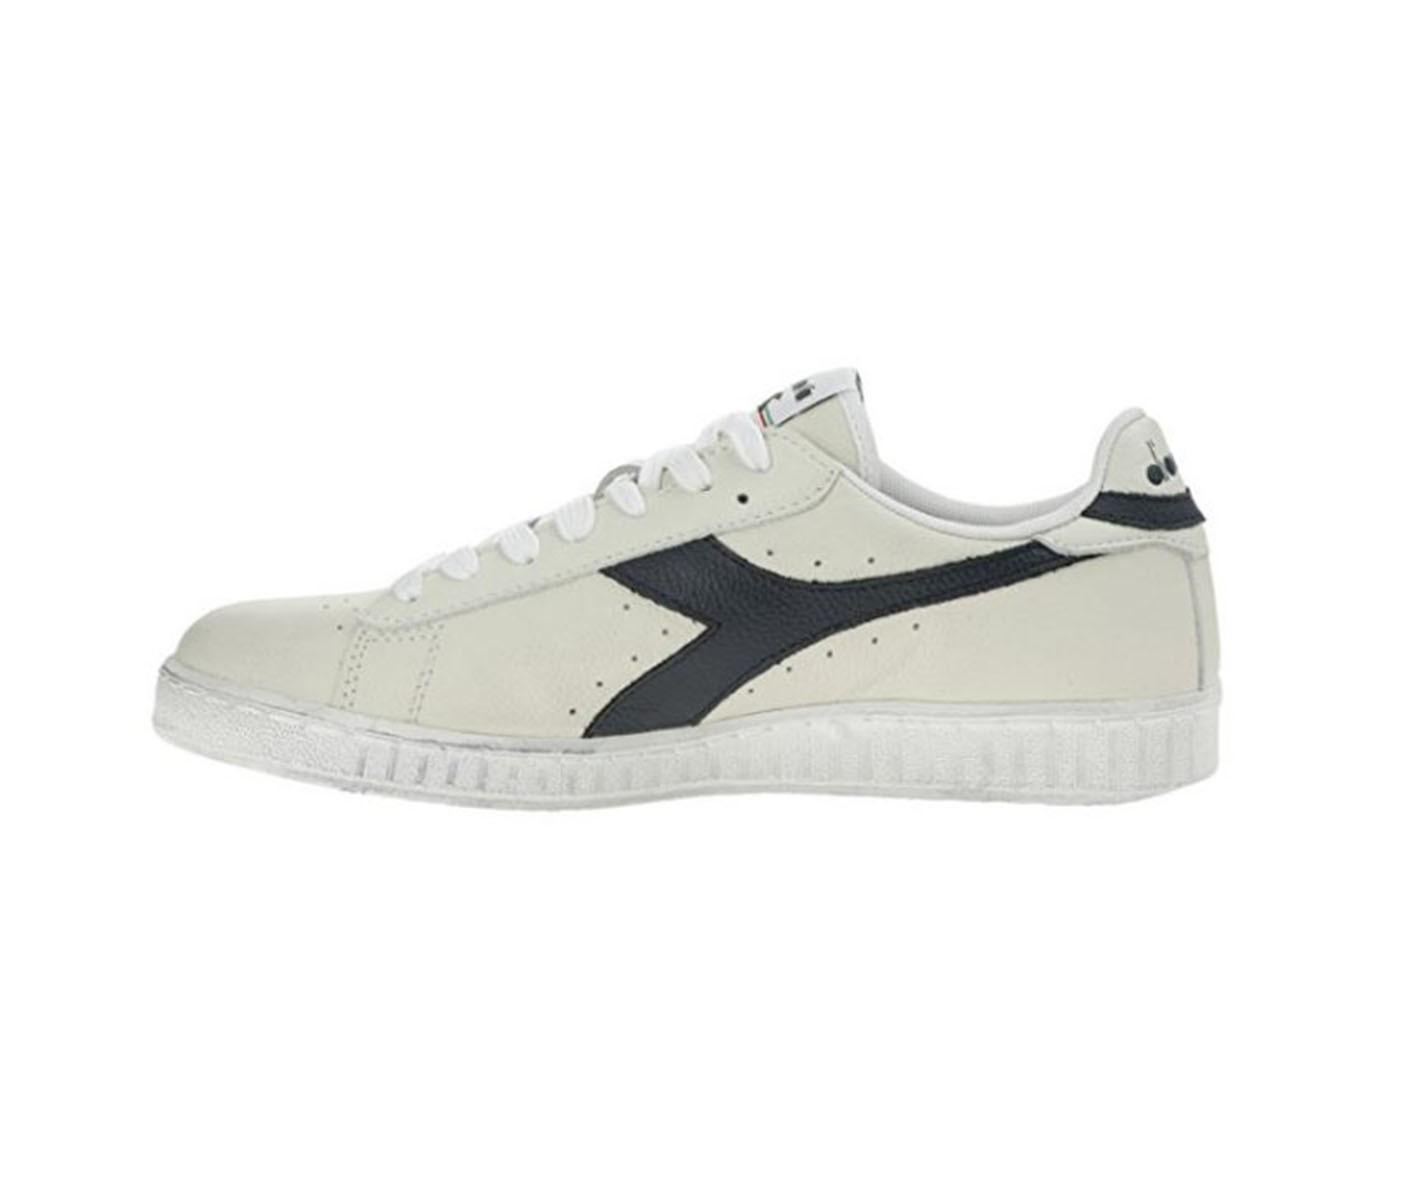 Scarpe uomo sneakers DIADORA GAME L LOW WAXED in pelle bianca  501.160821-C5262 d5281e1c4ce